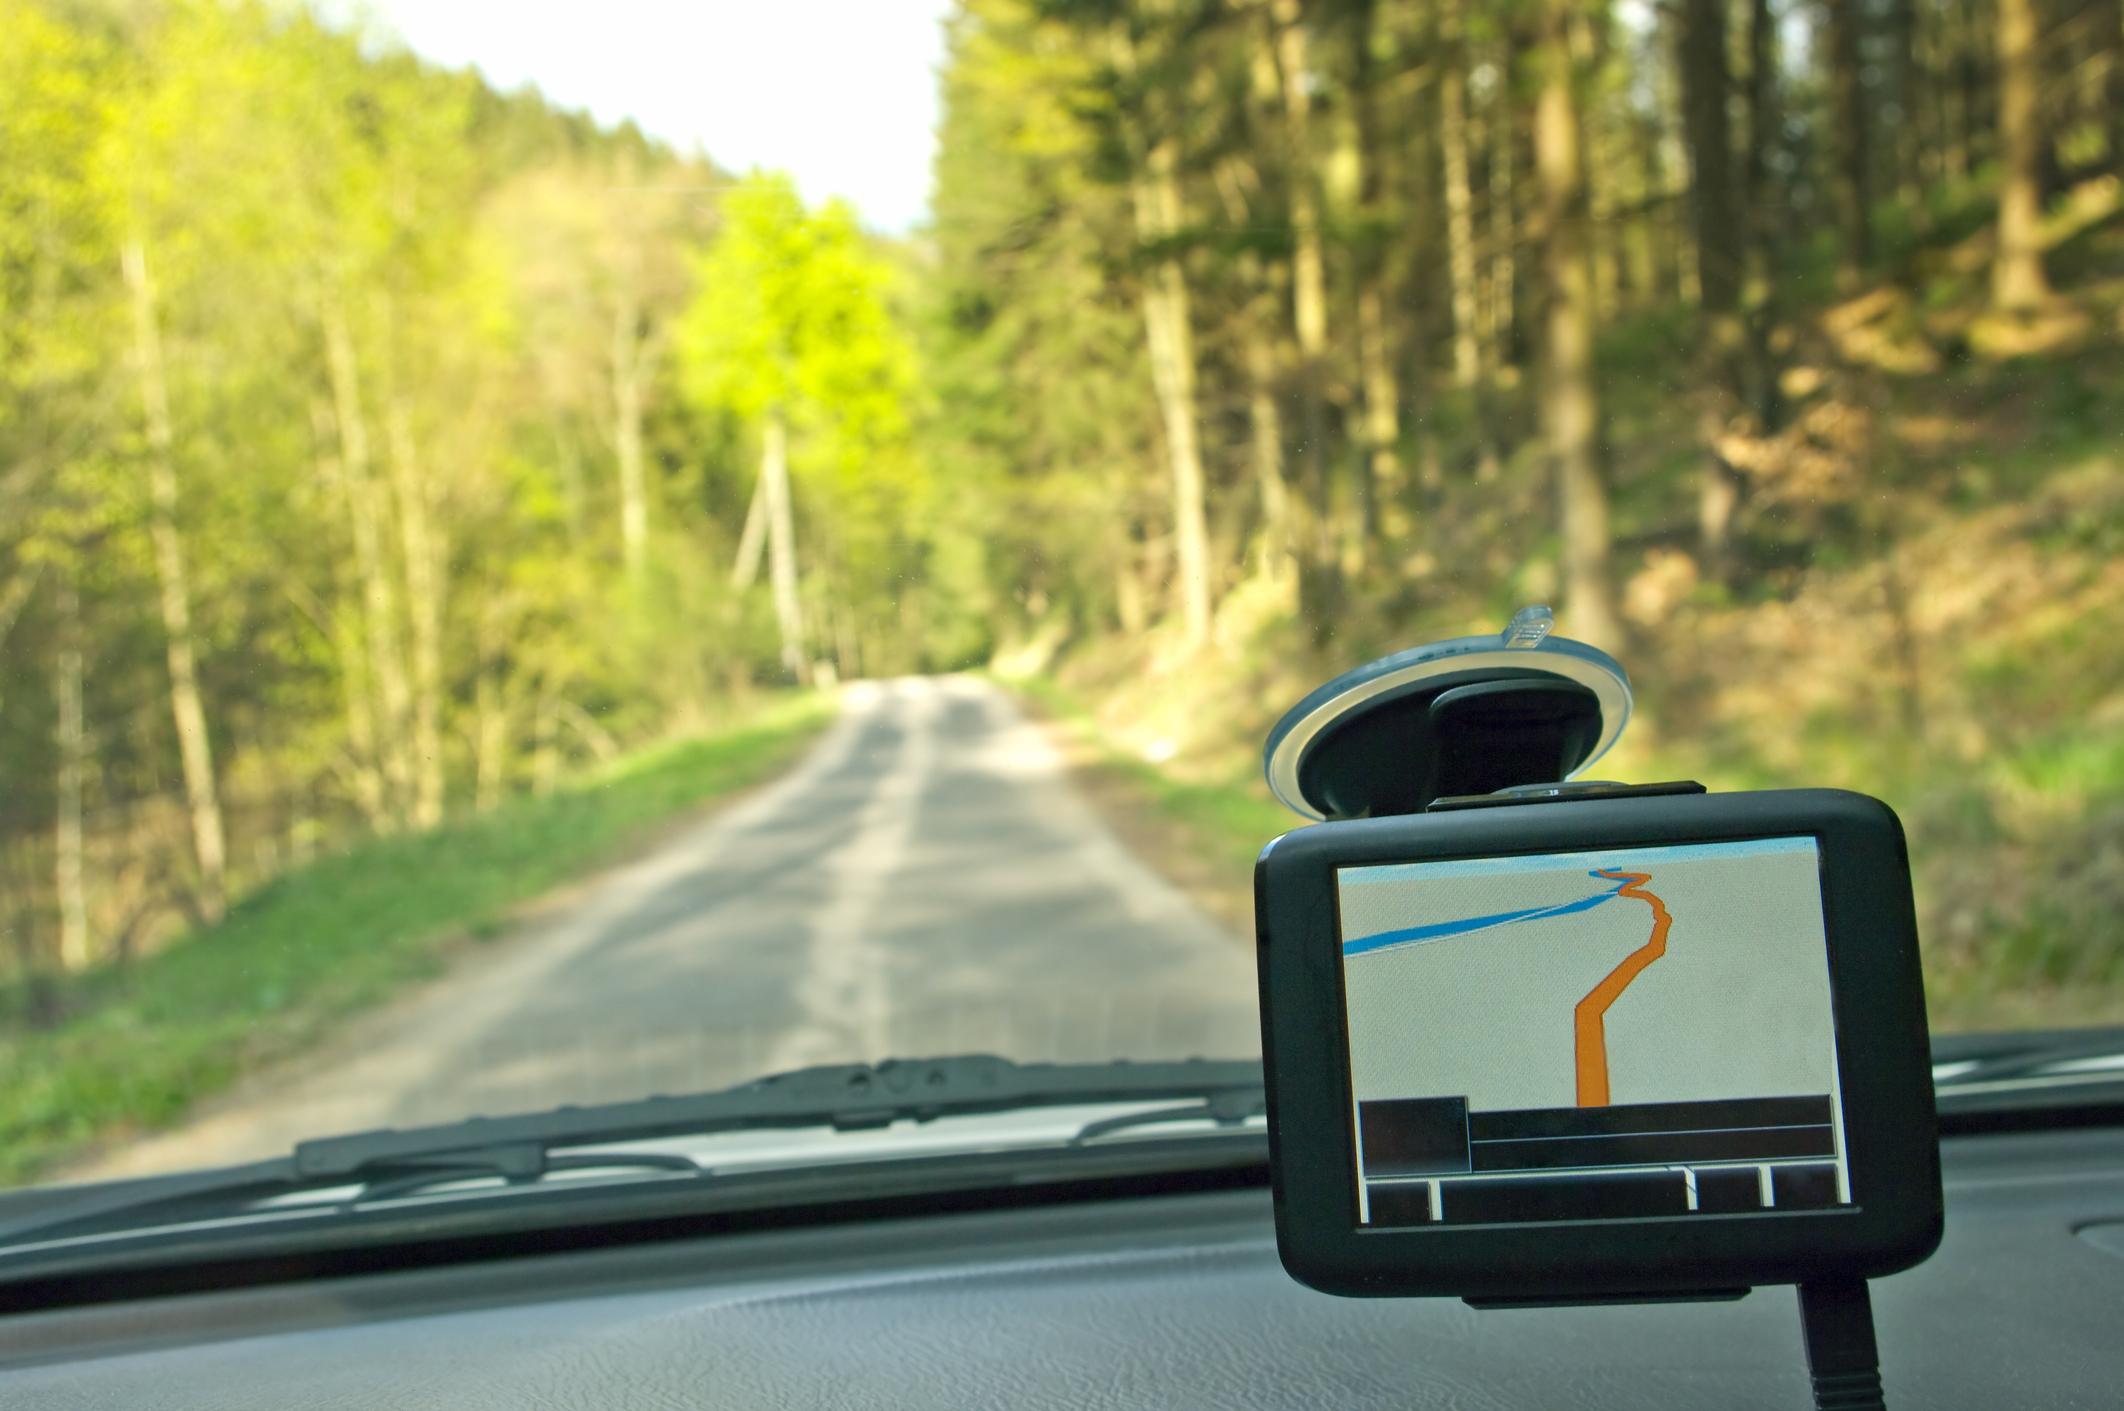 image GPS – Global Positioning System